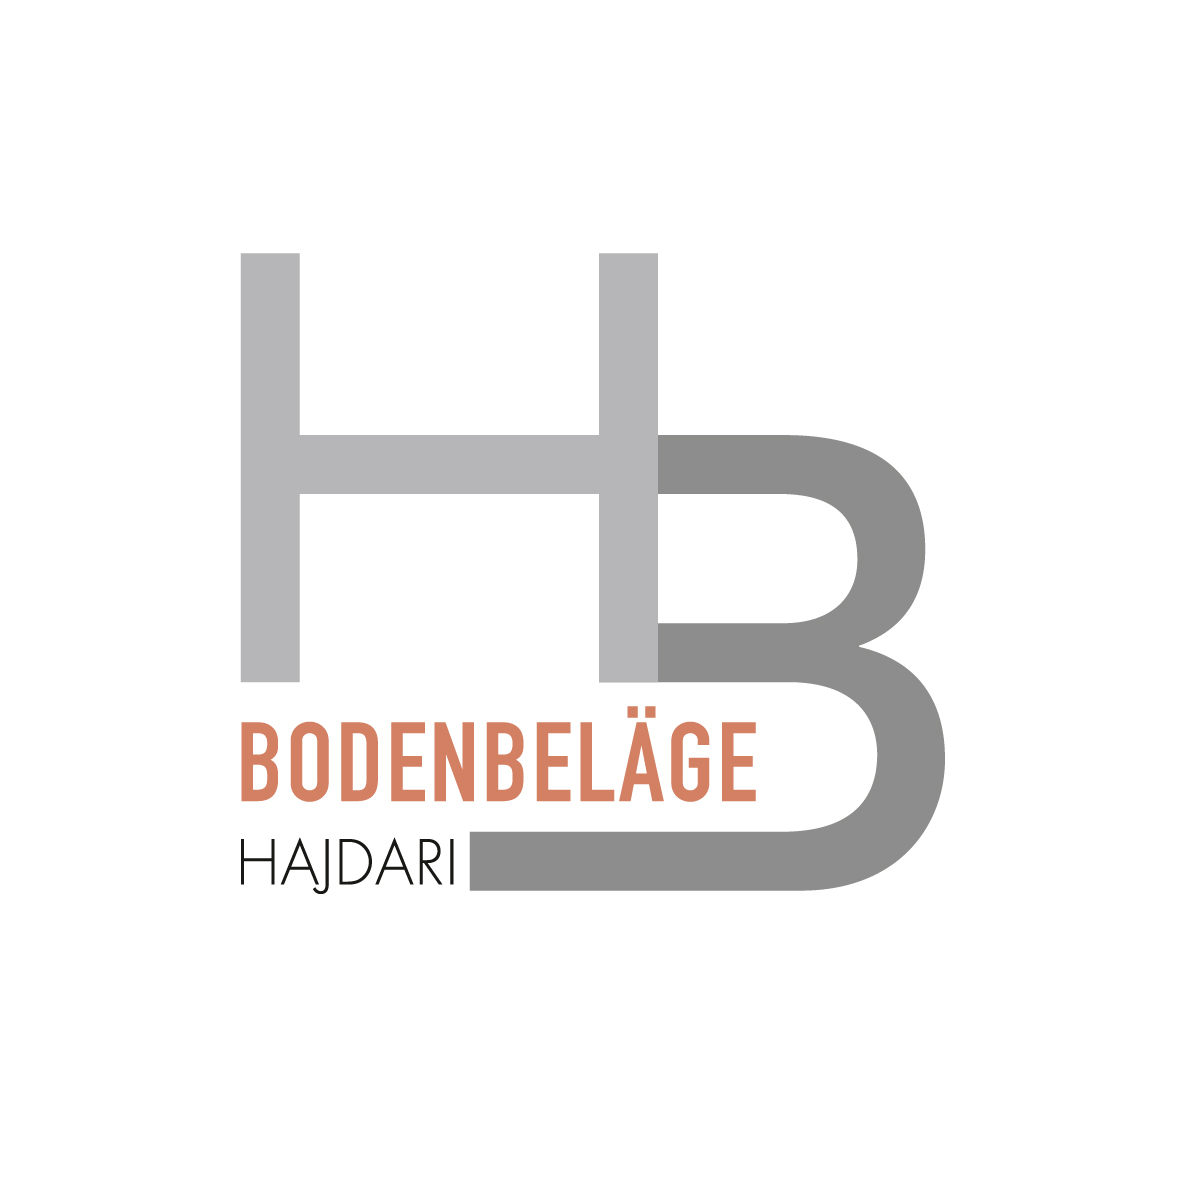 Bodenbeläge Hajdari GmbH